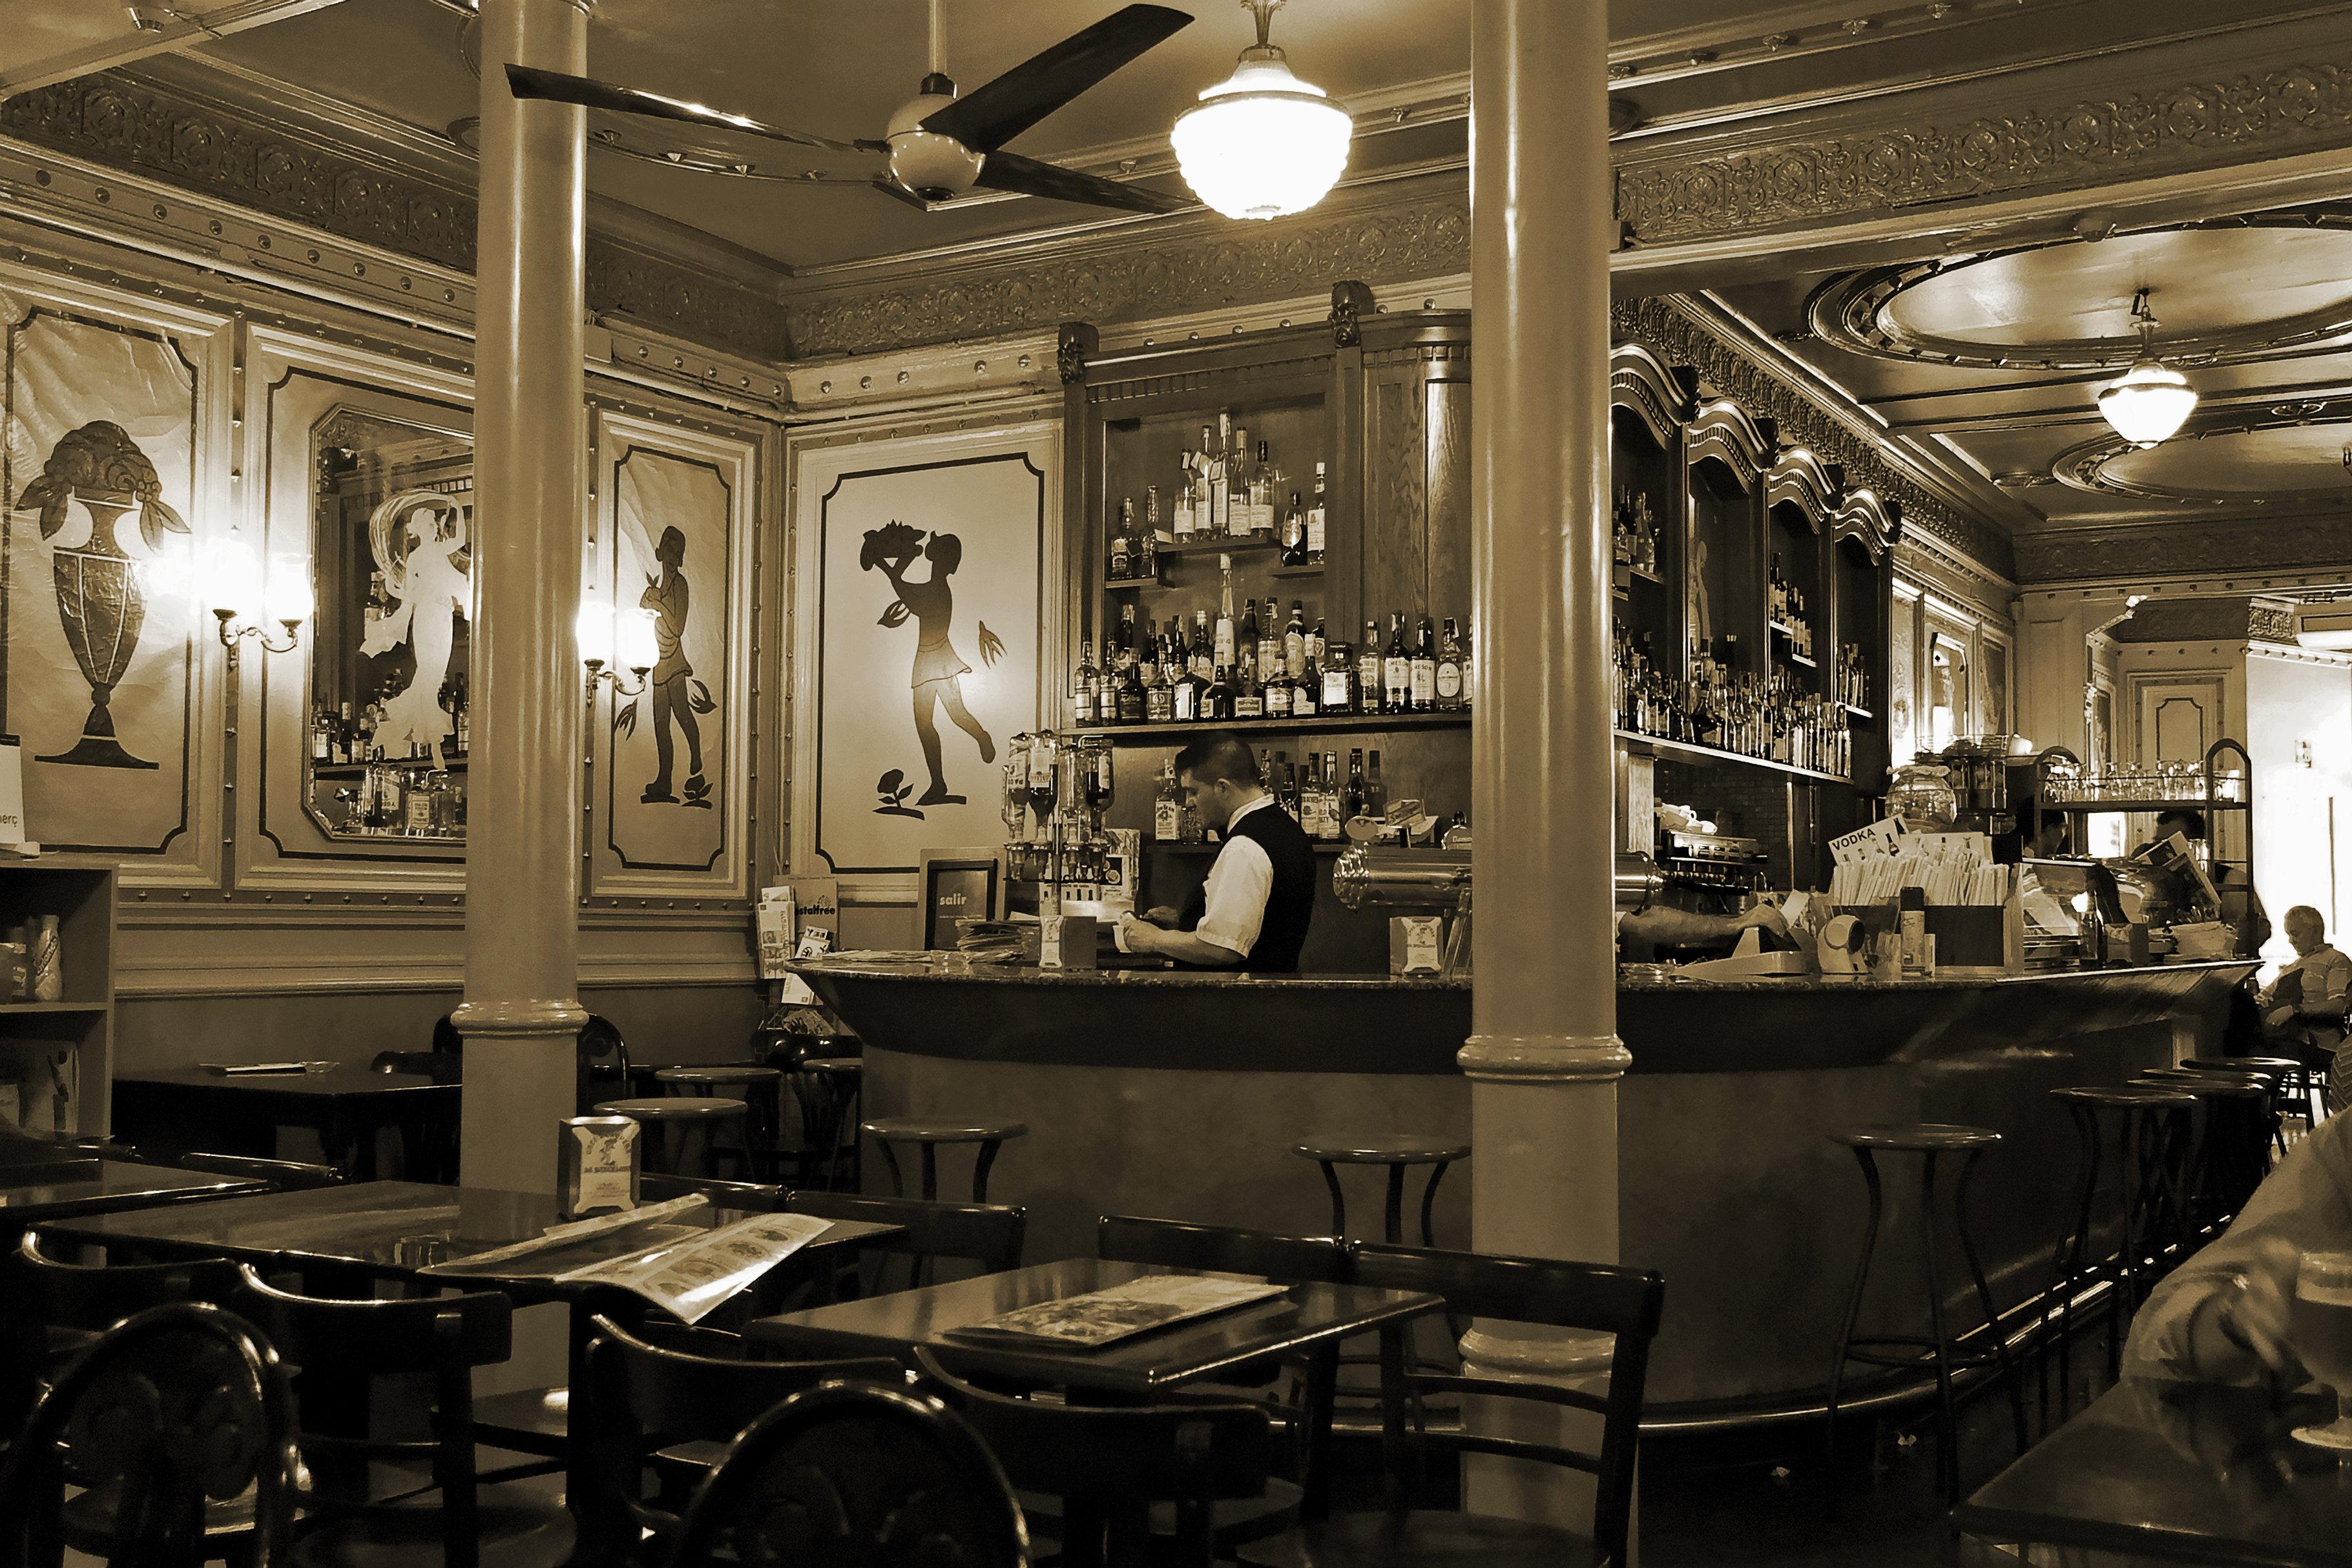 Barcelona: Cafe de l'Opera